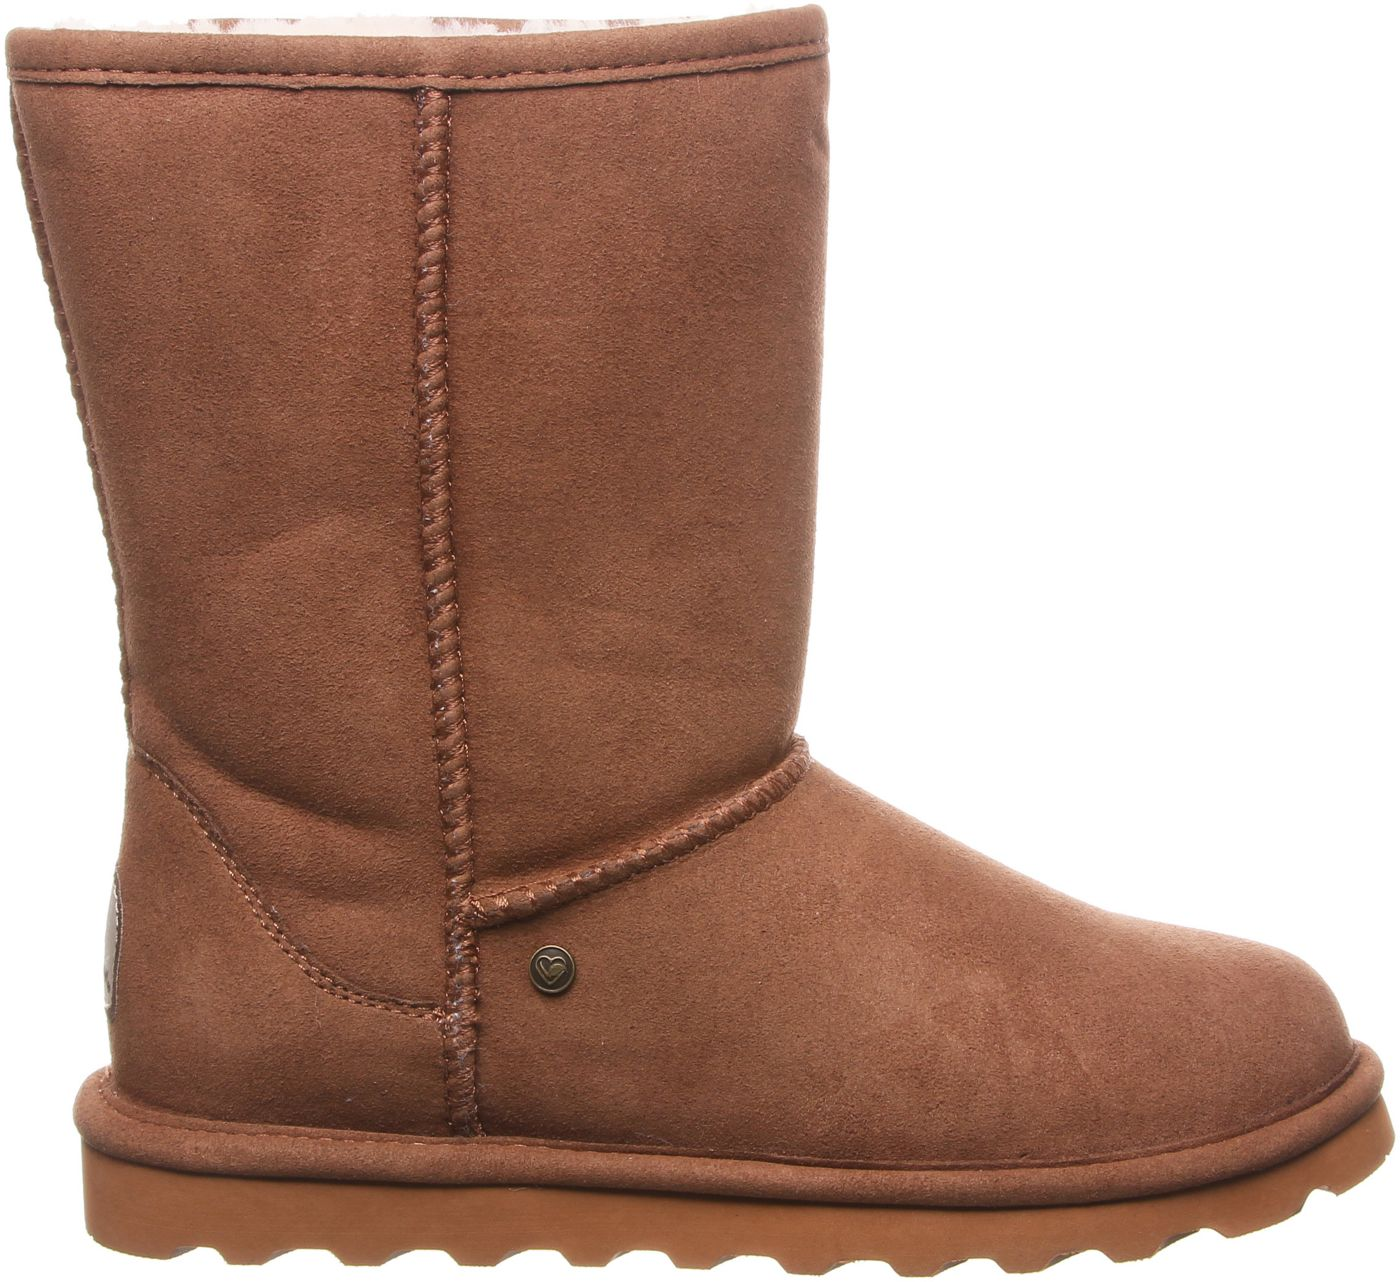 BEARPAW Women's Vegan Elle Short Winter Boots